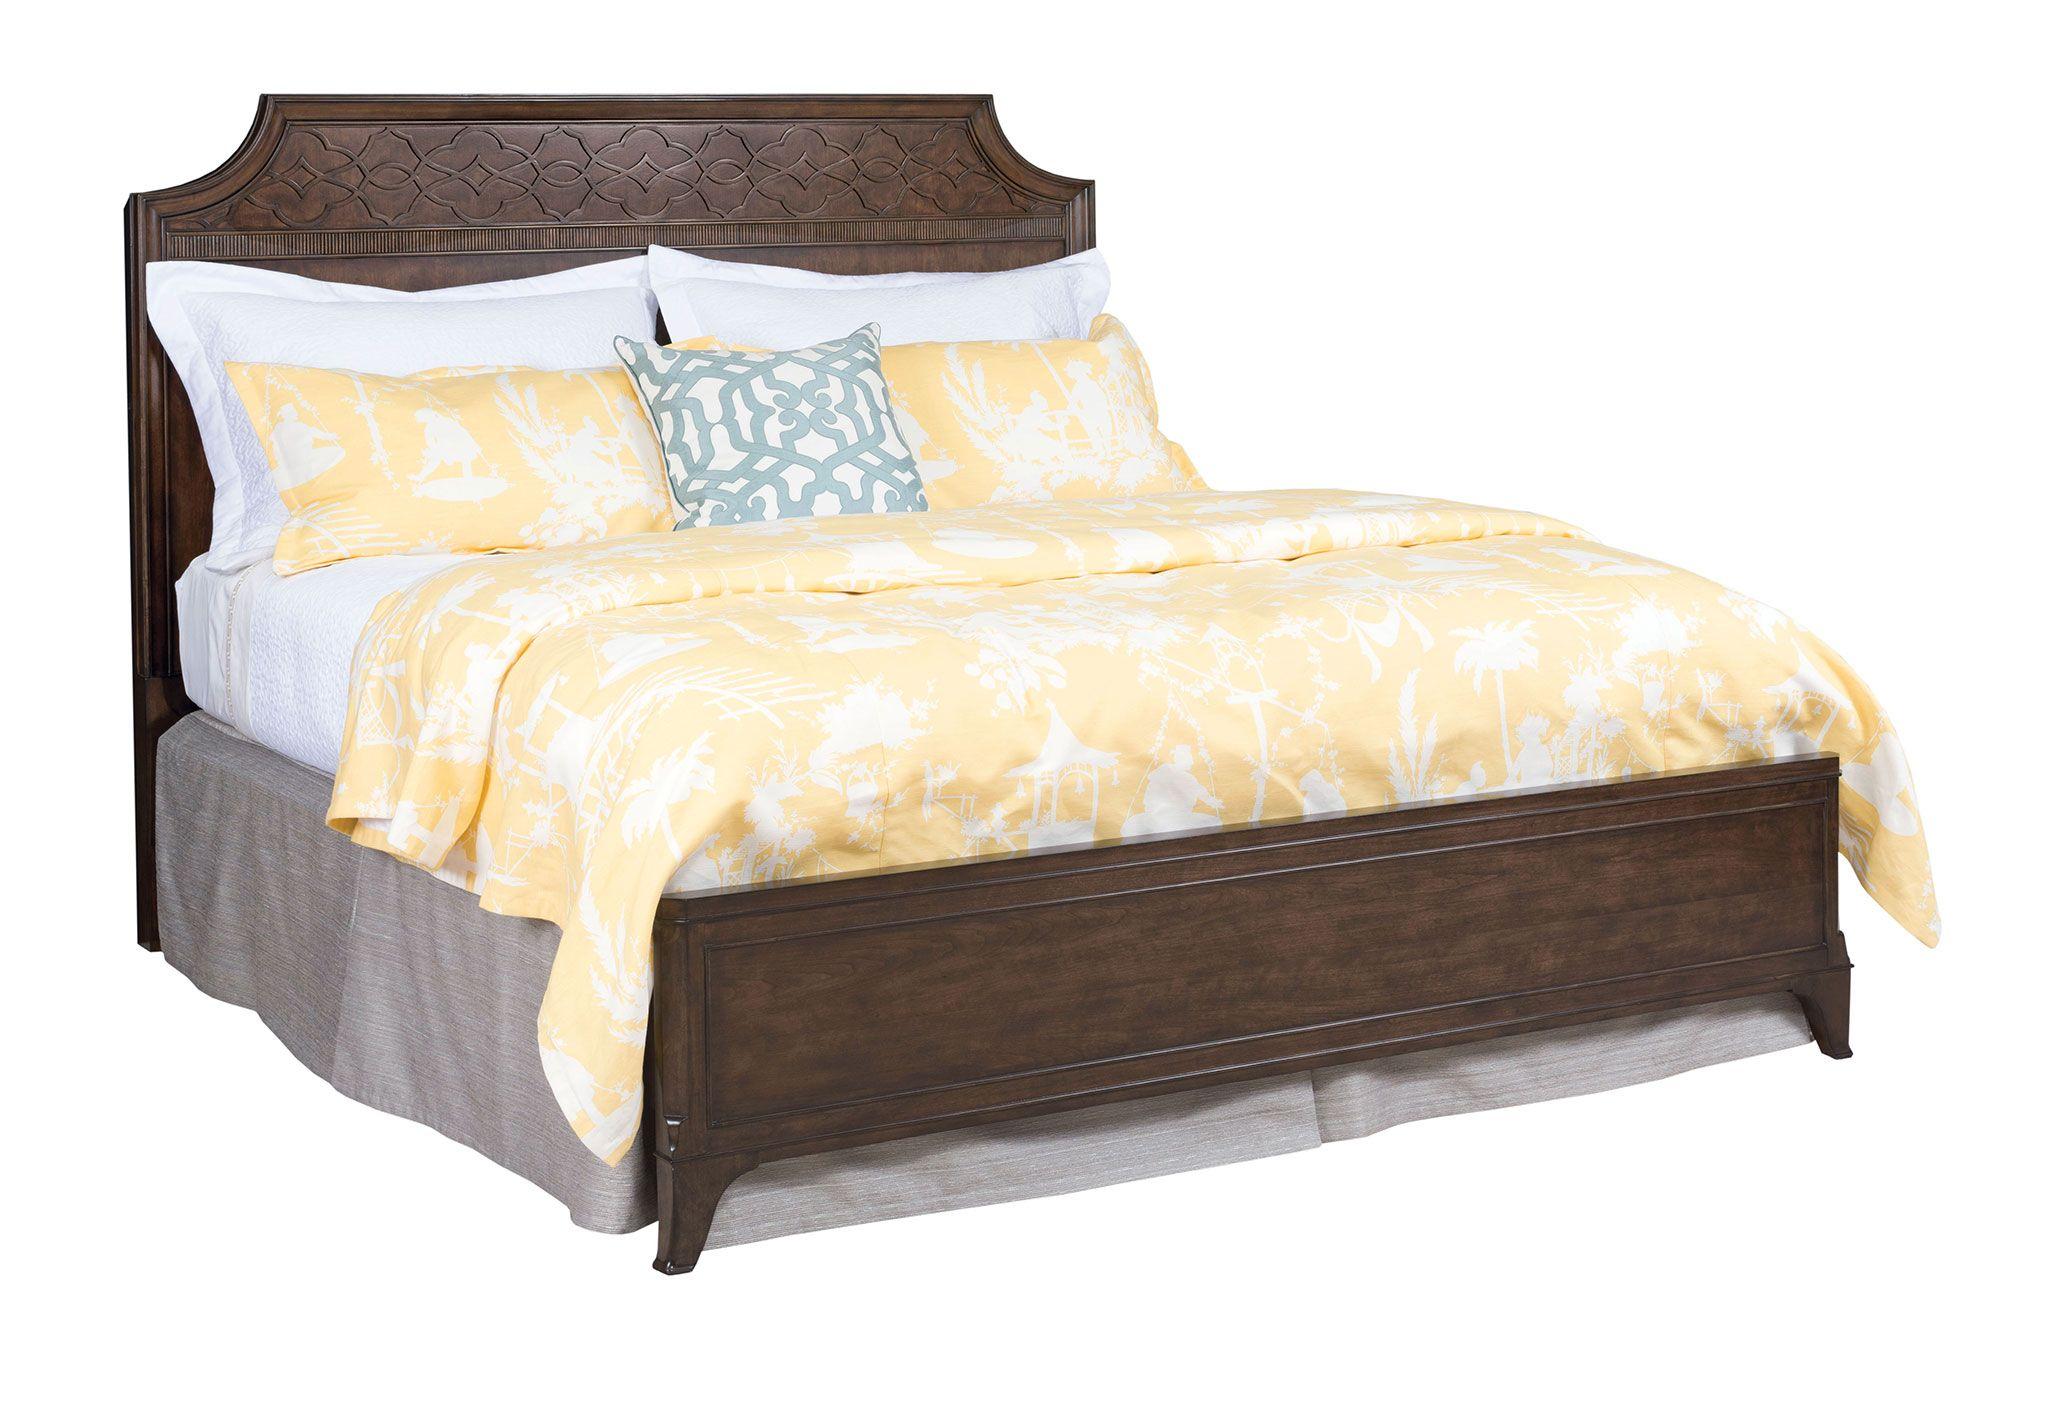 American Drew Grantham Hall King Panel Bed   - Item Number: 512-336R